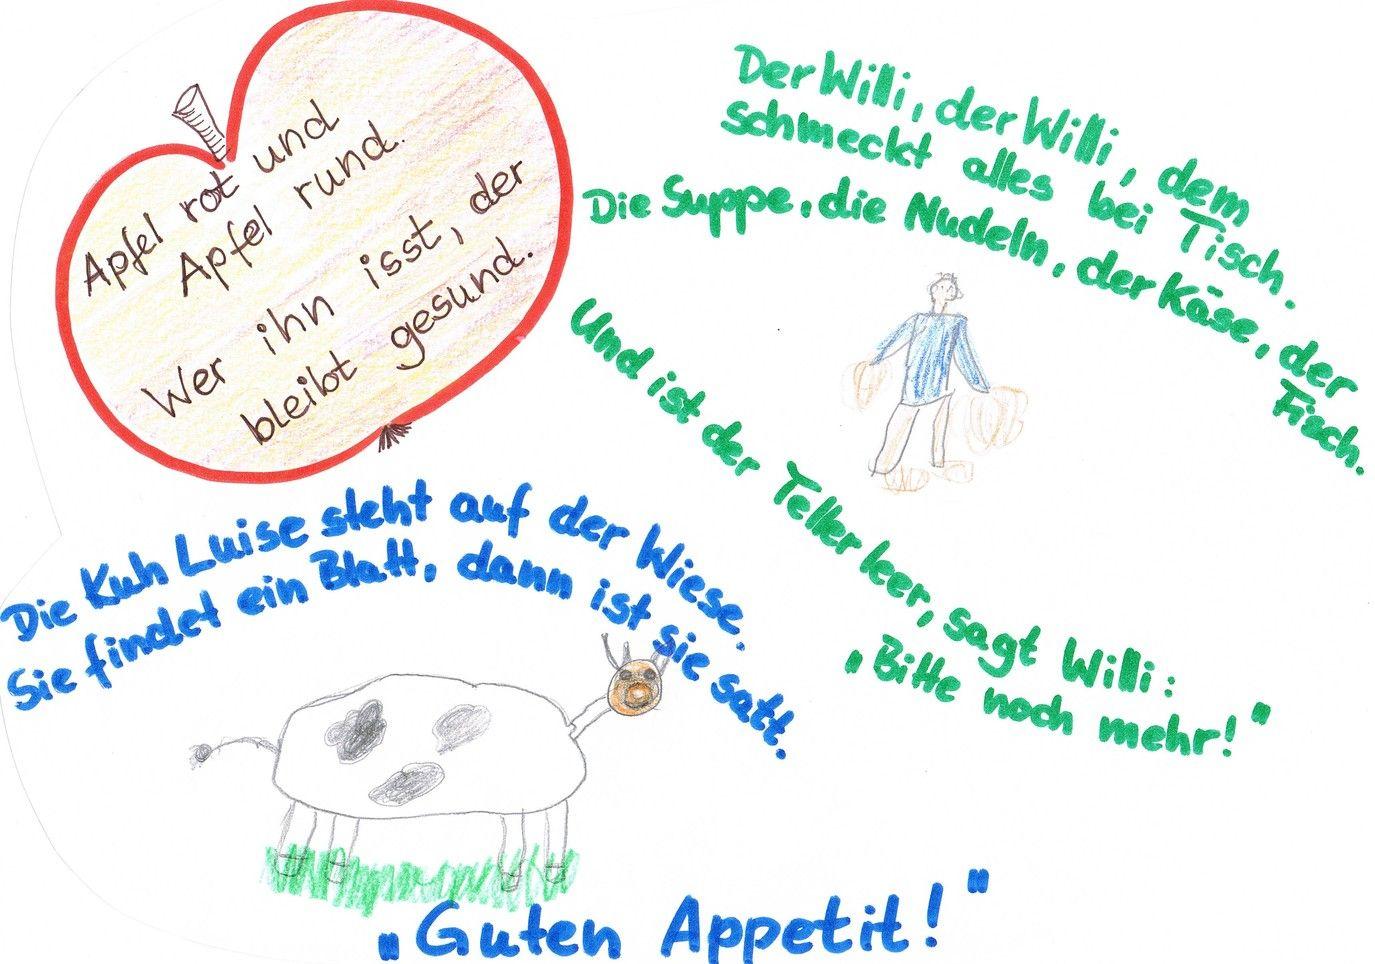 Merveilleux Http://www.guelzower Dorfspatzen.de/stuff/Tischspr%C3%BCche | Kita:  TEXTE Various | Pinterest | Kindergarten